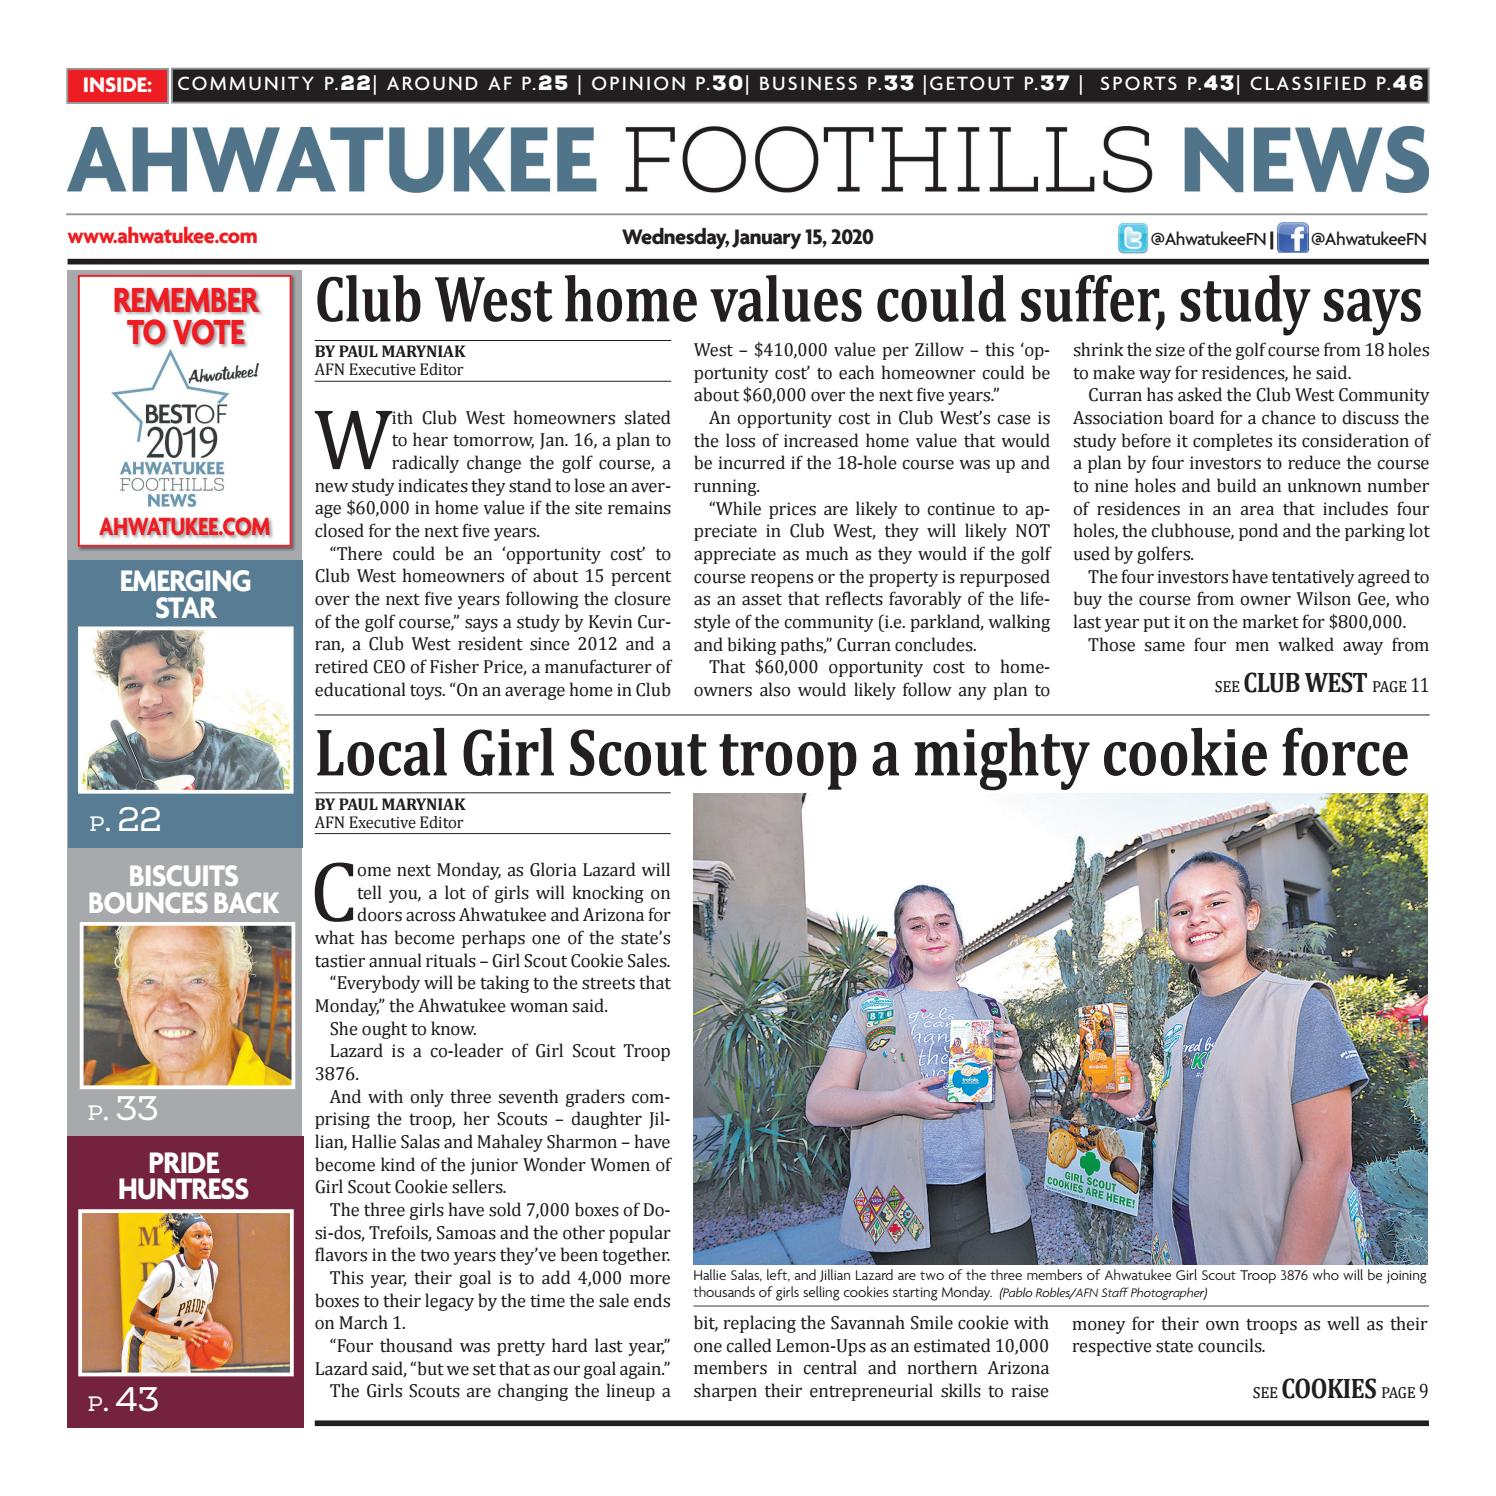 Ahwatukee Foothills News January 15